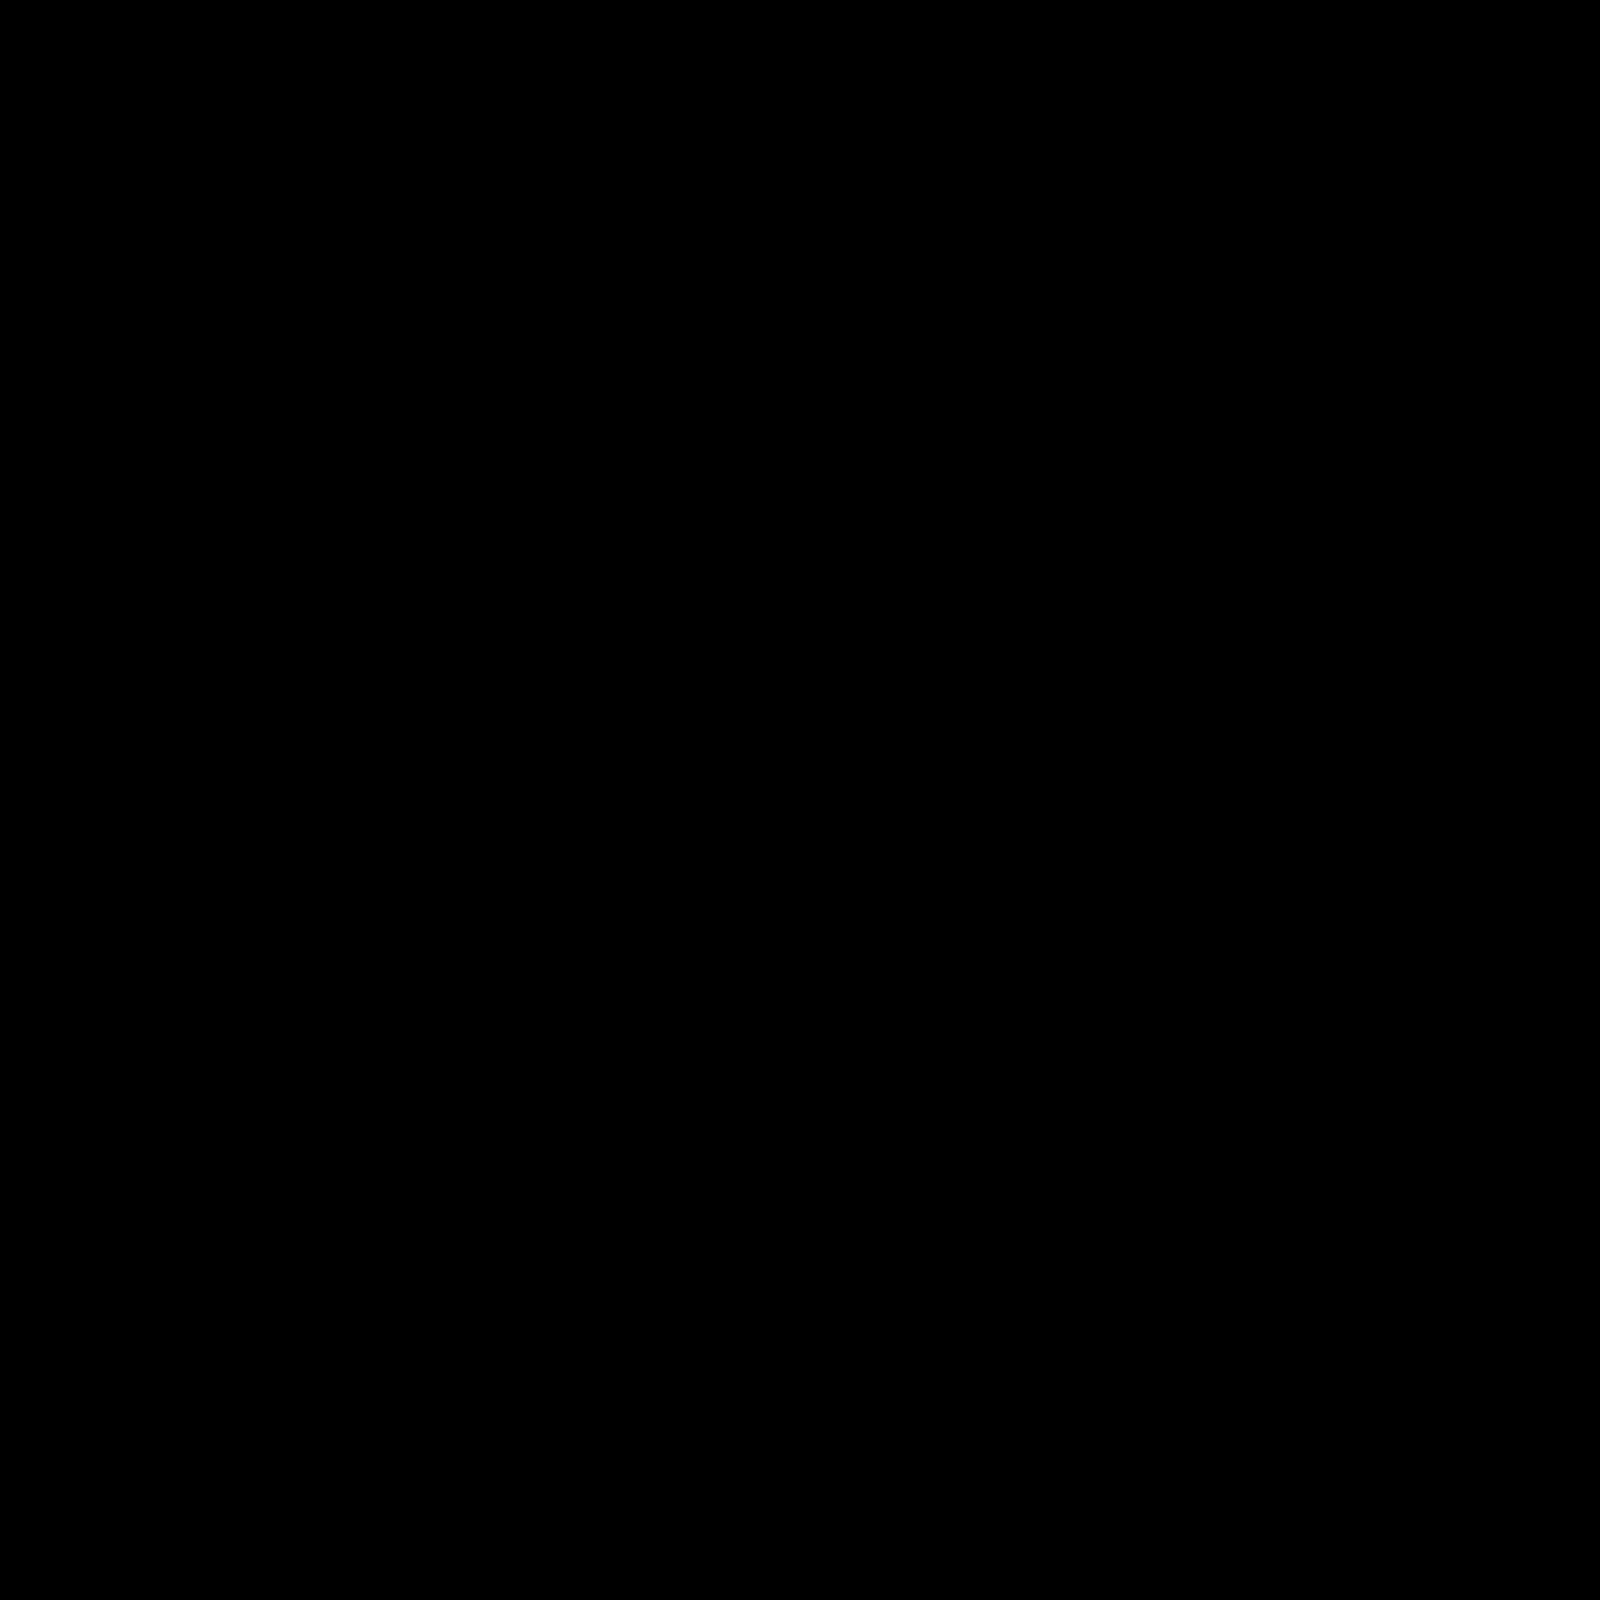 Jack of Spades icon